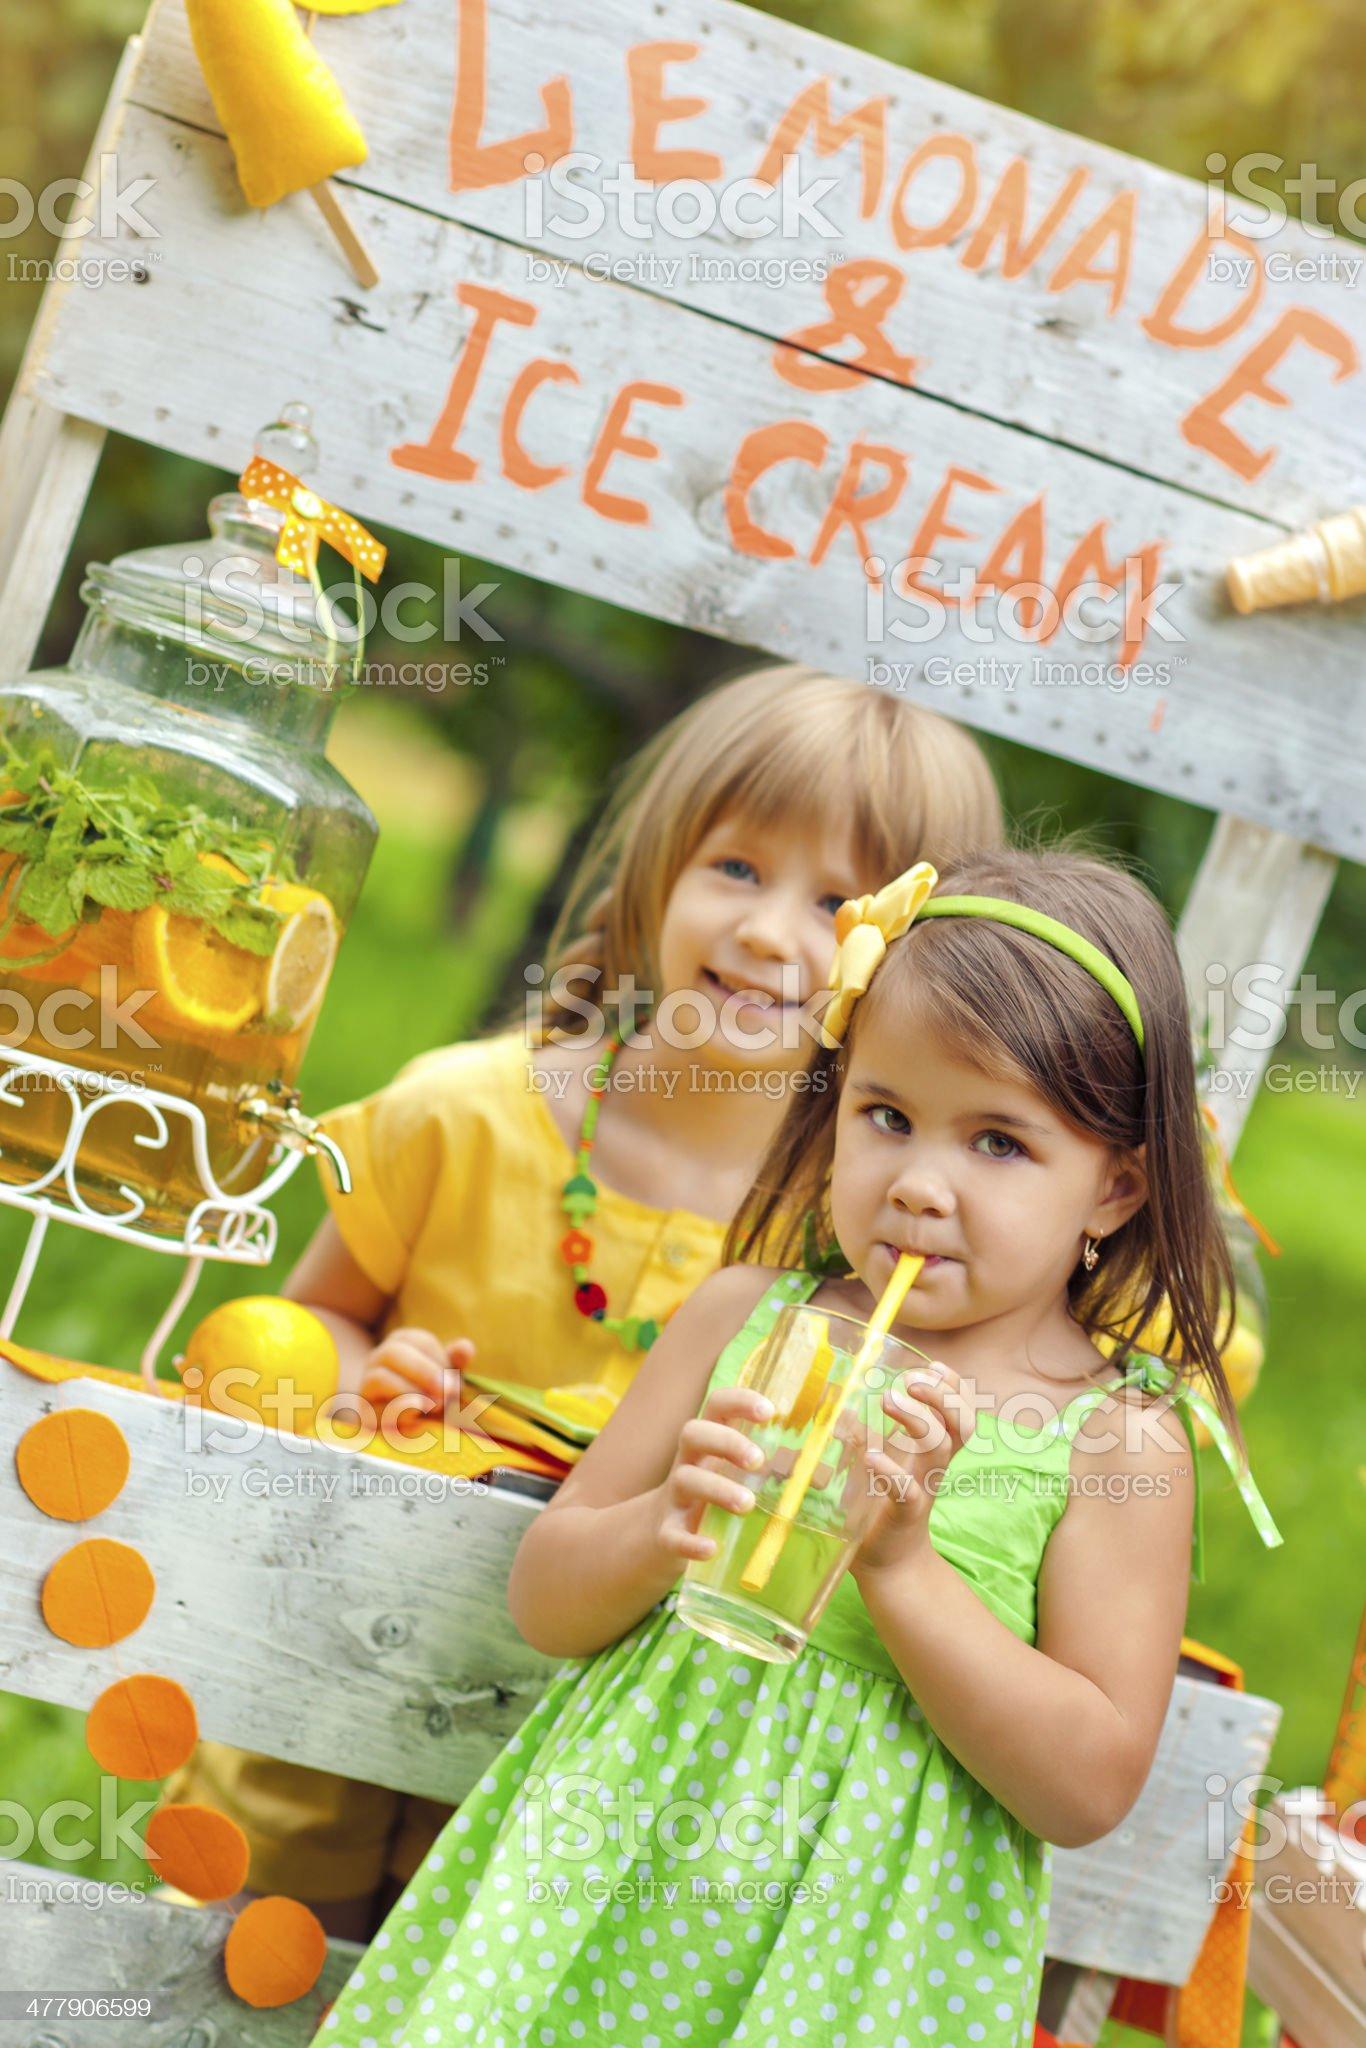 Lemonade stand royalty-free stock photo